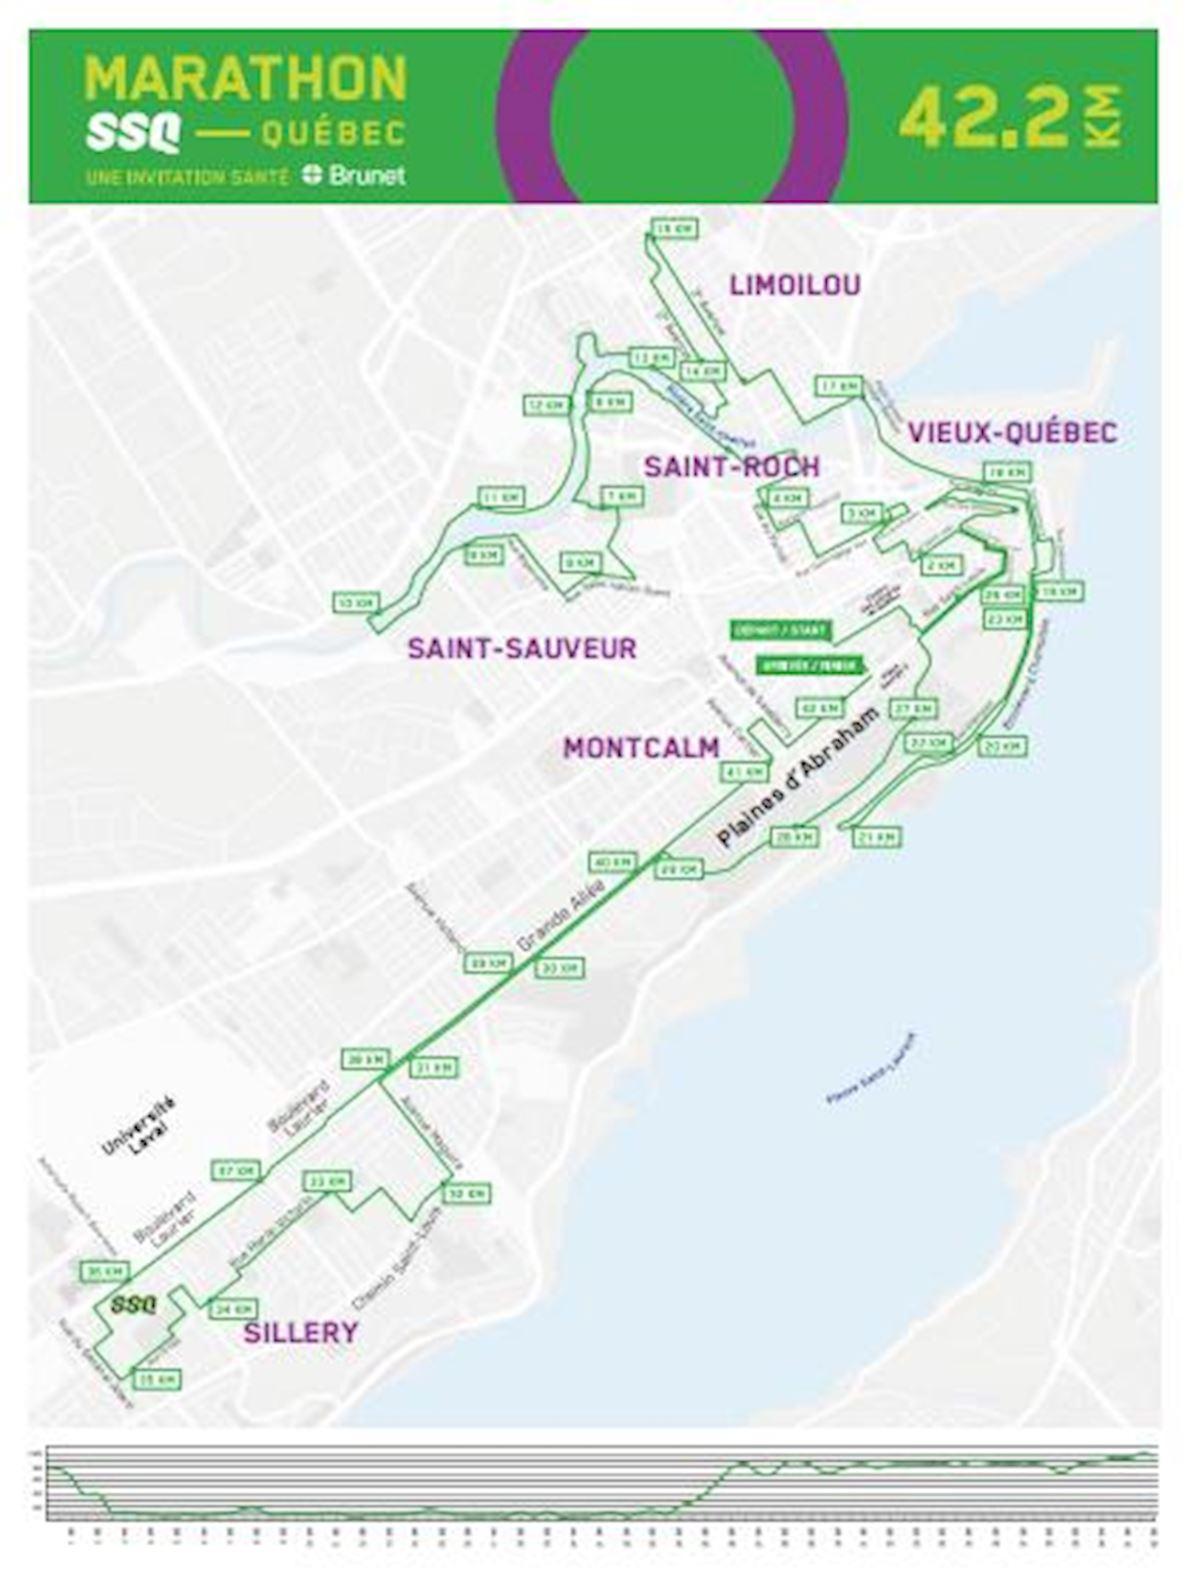 SSQ Quebec City Marathon Route Map